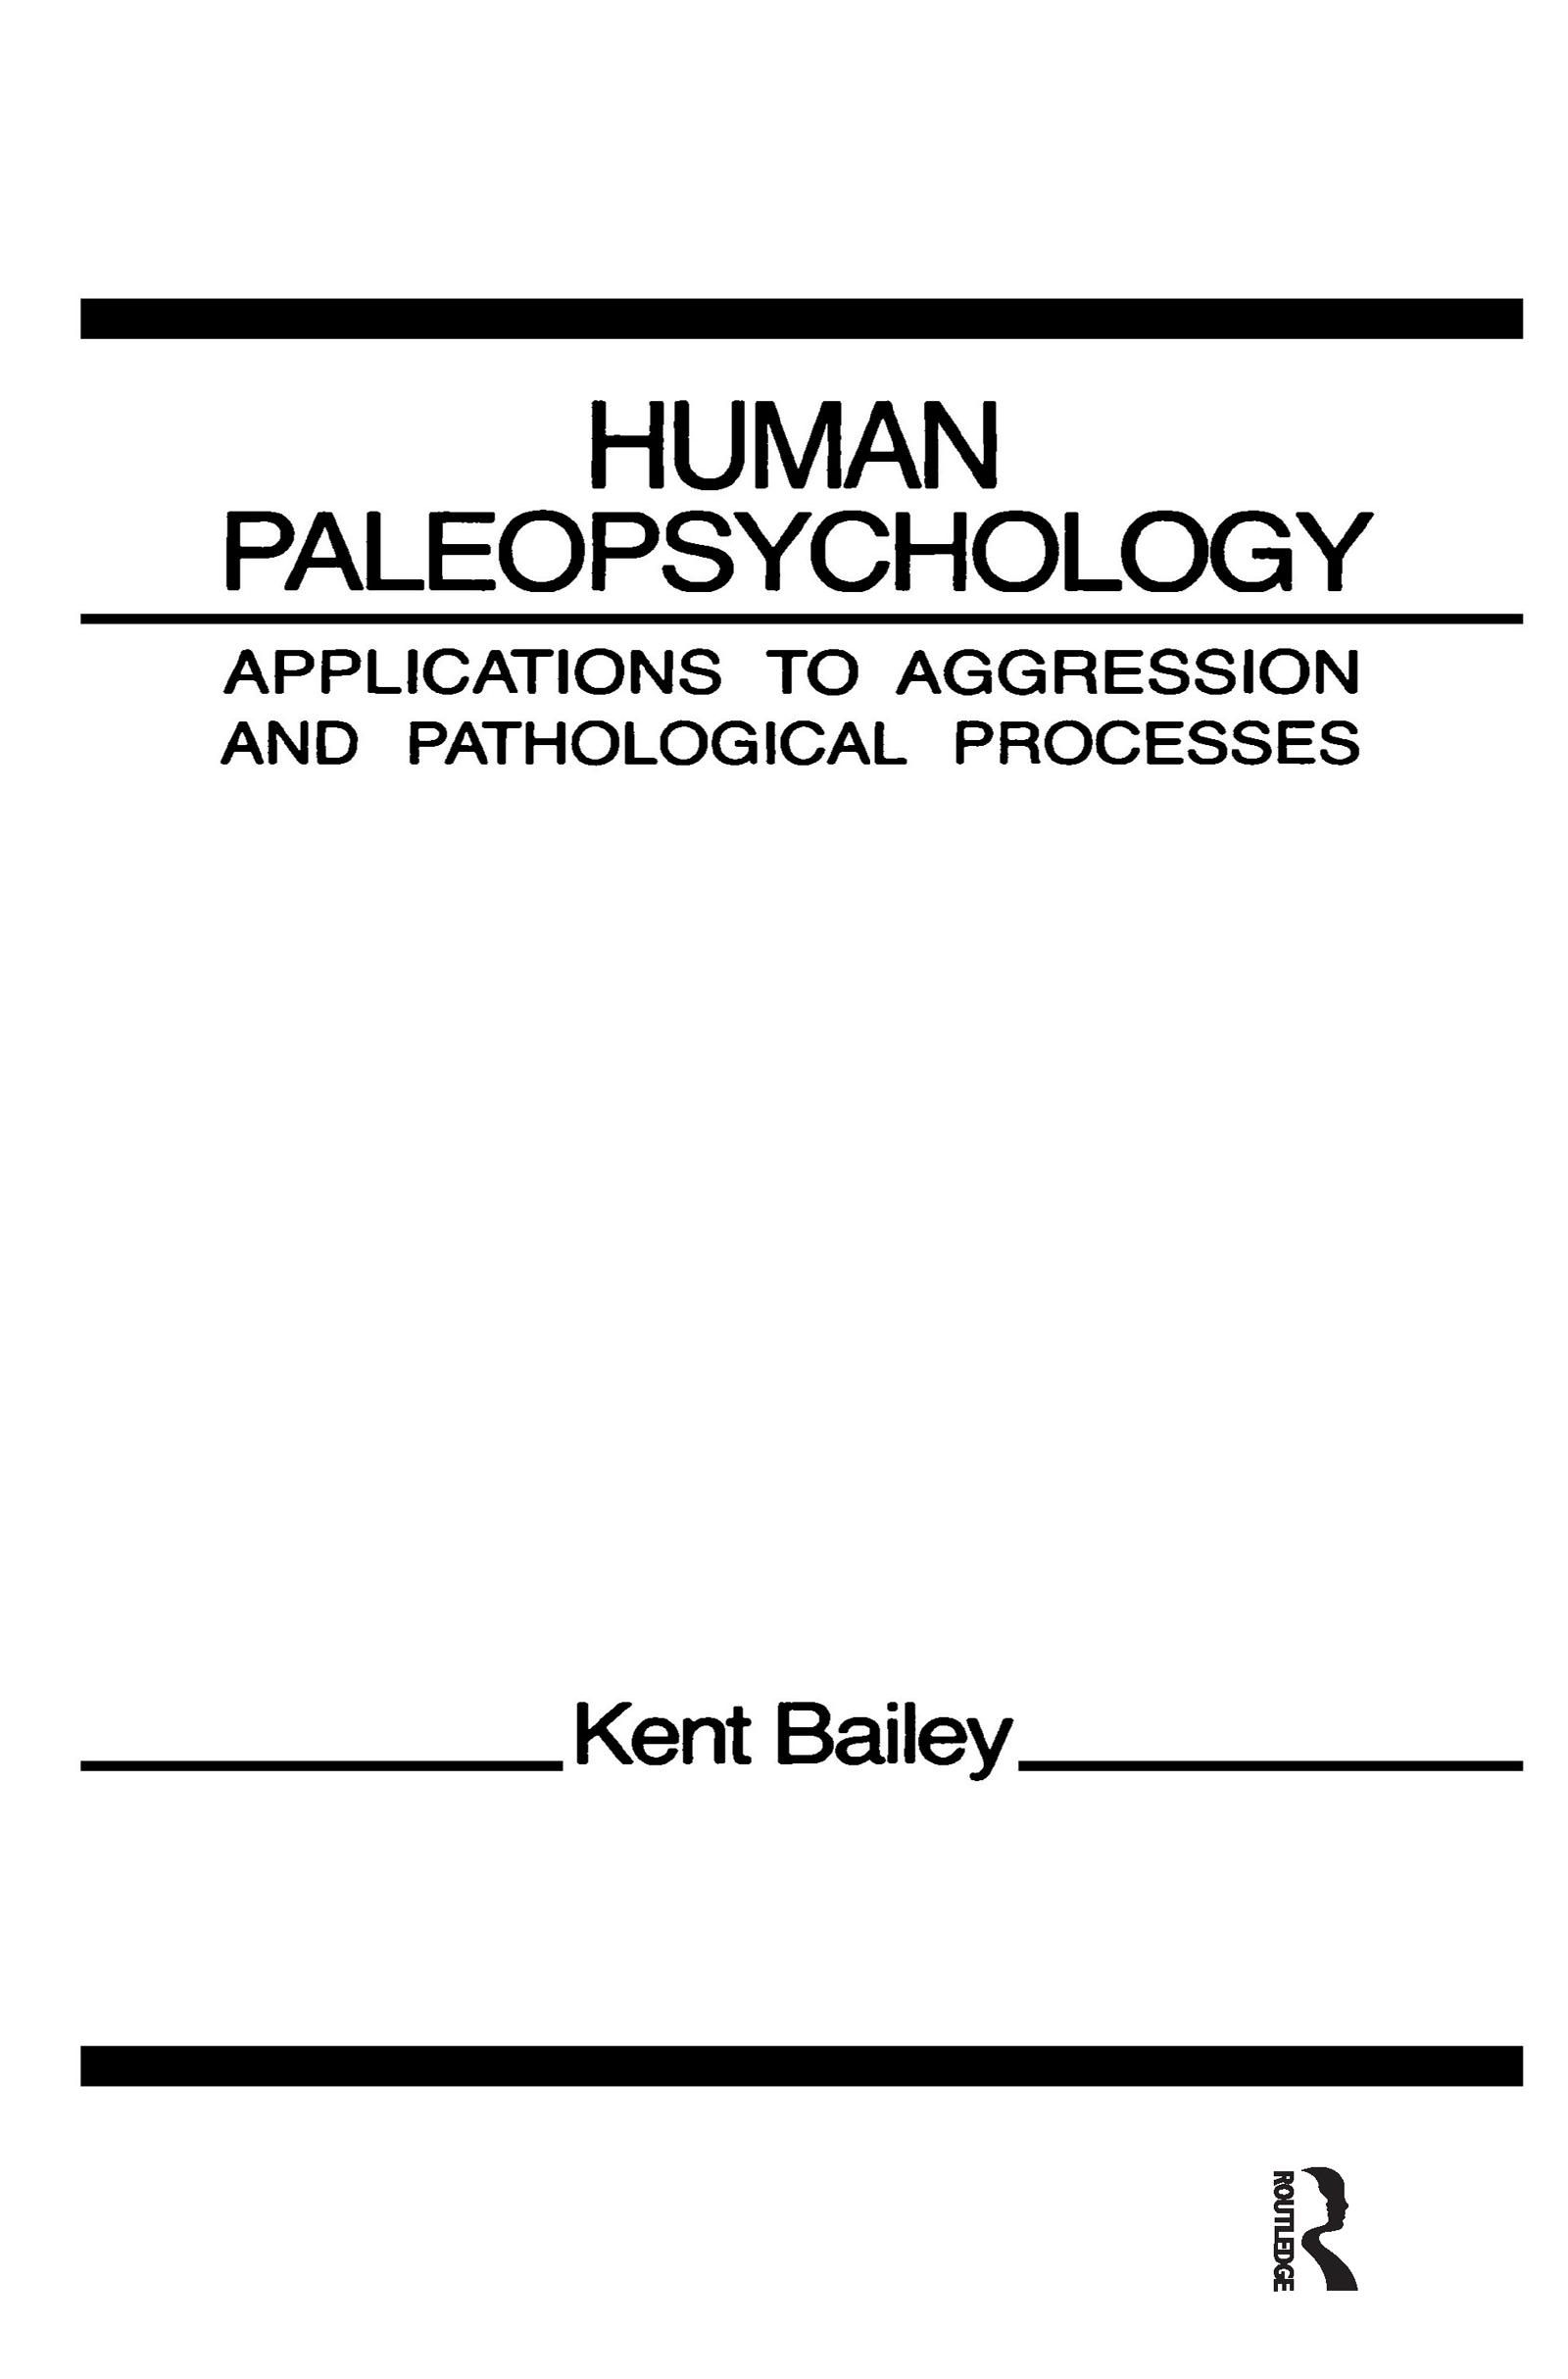 1 Paleopsychological Bases of Aggression in Humans